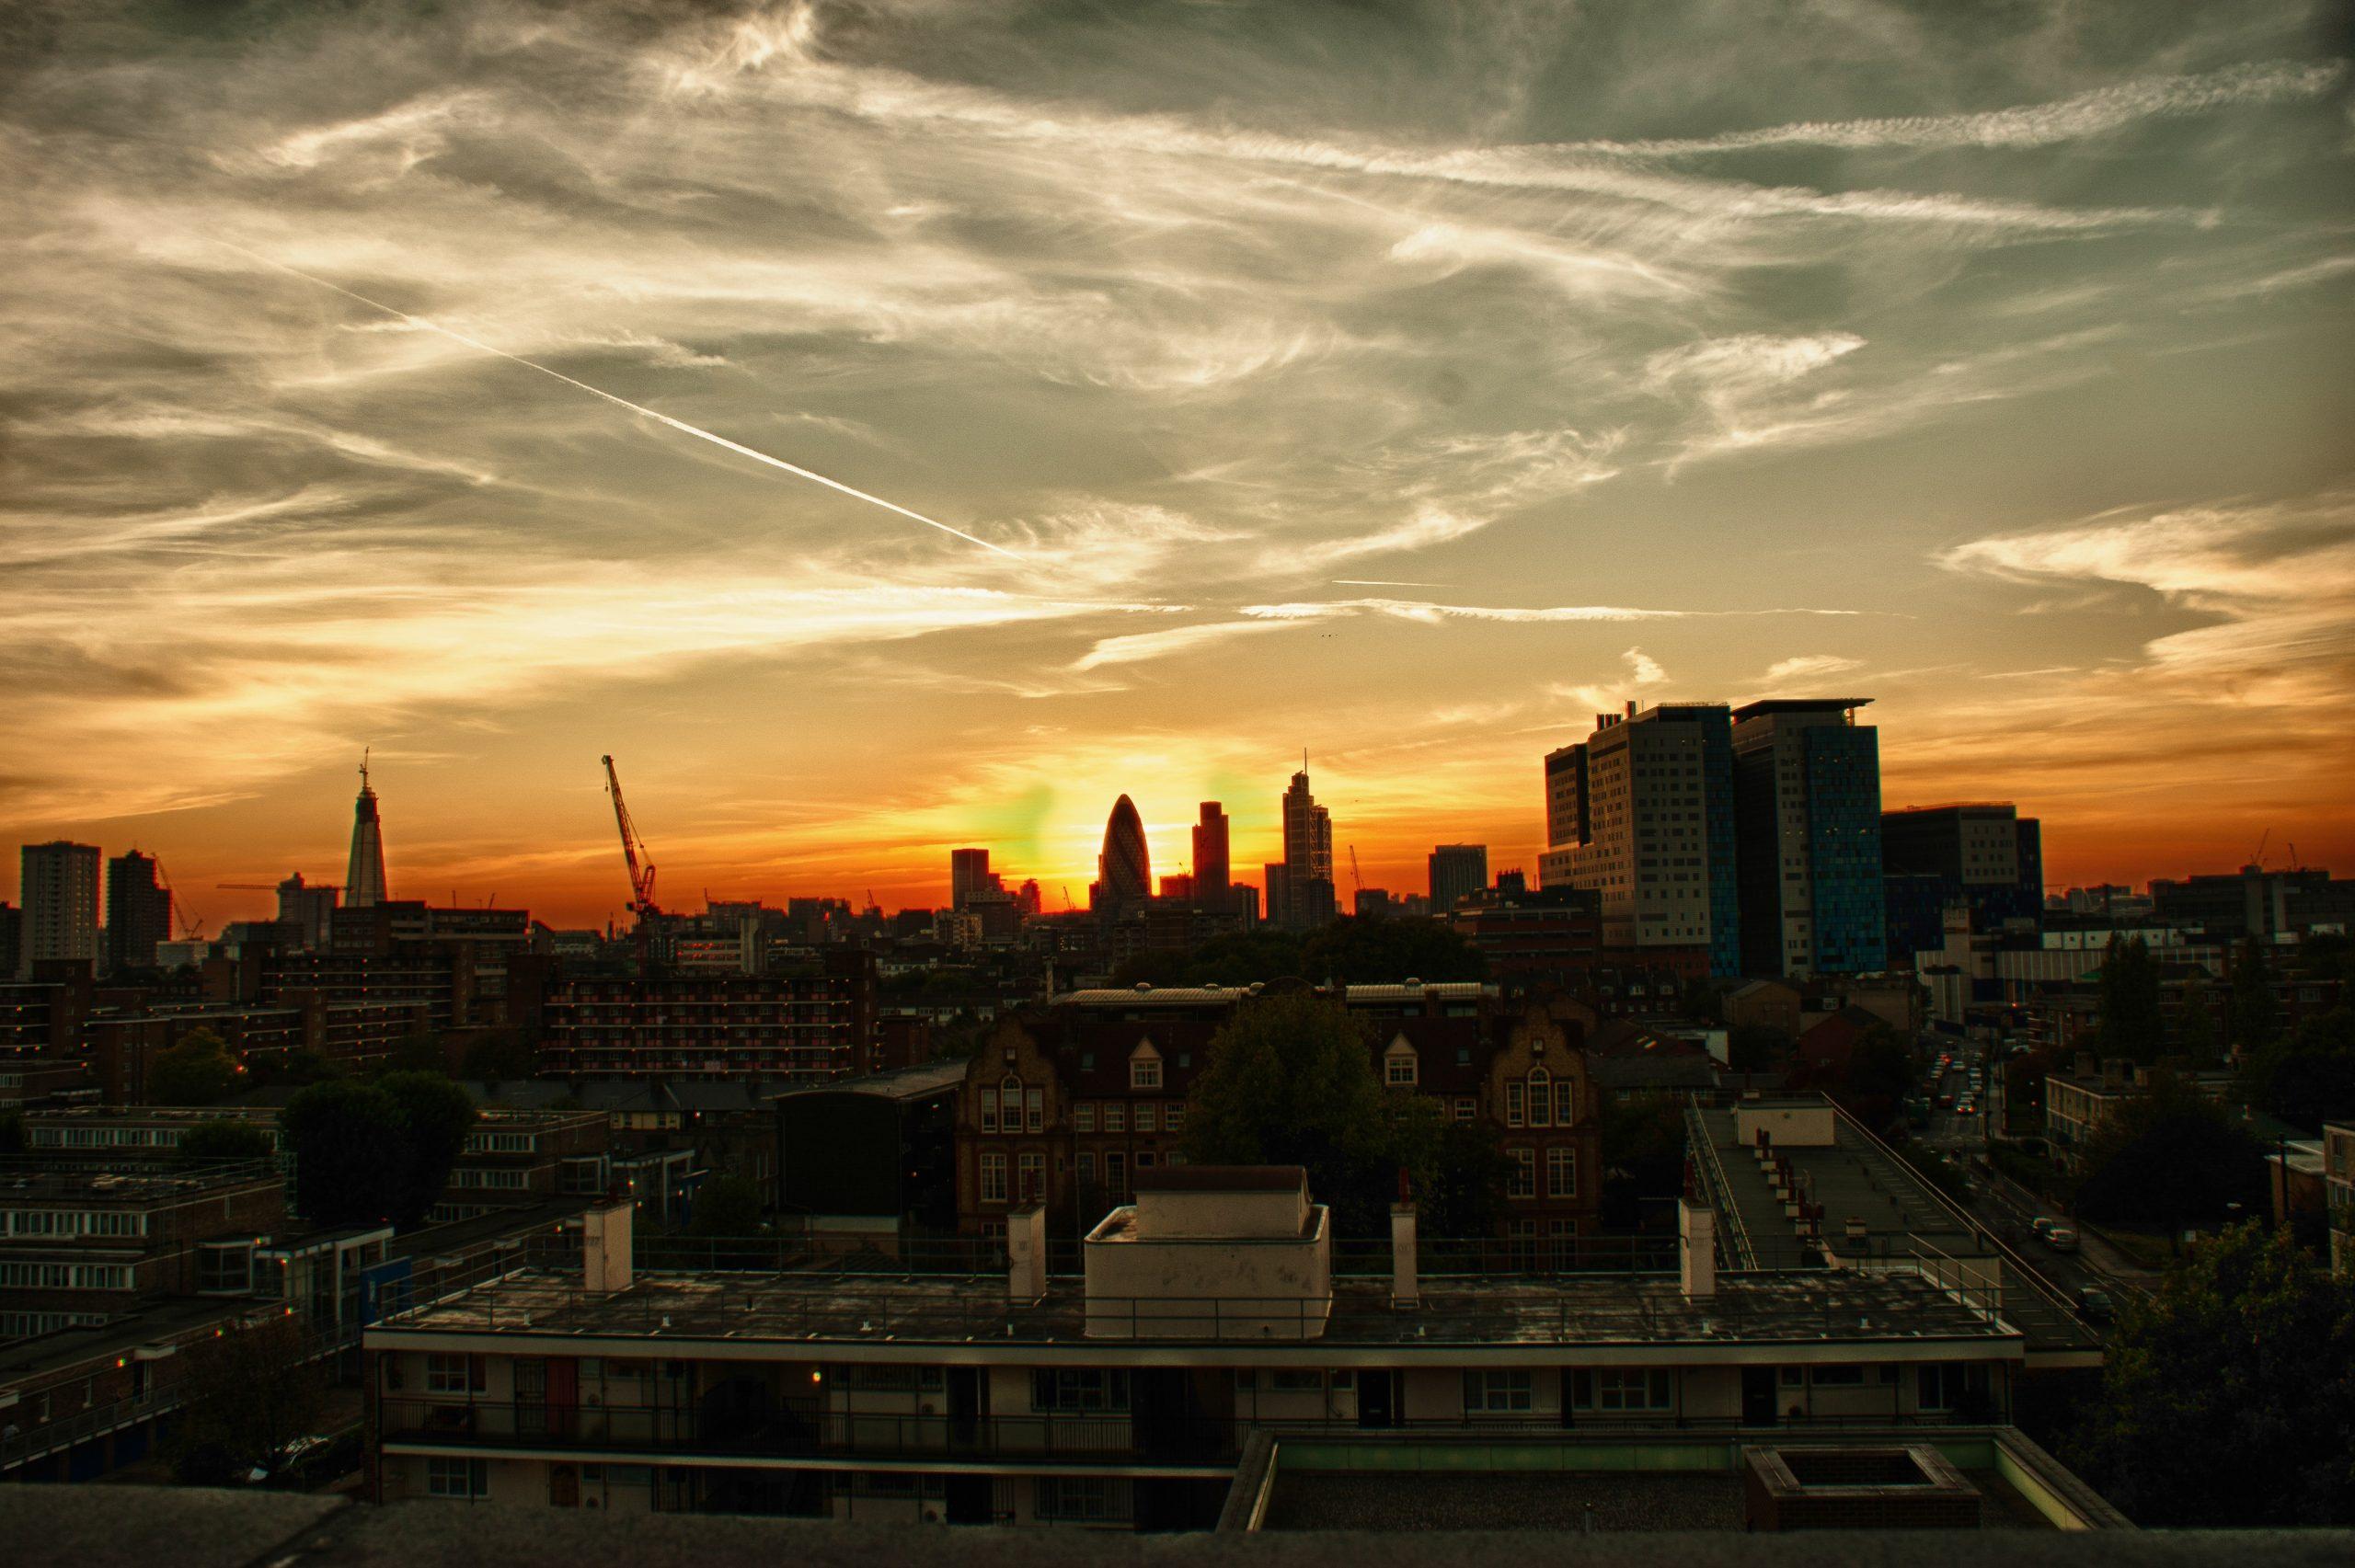 Tower Hamlets sunrise